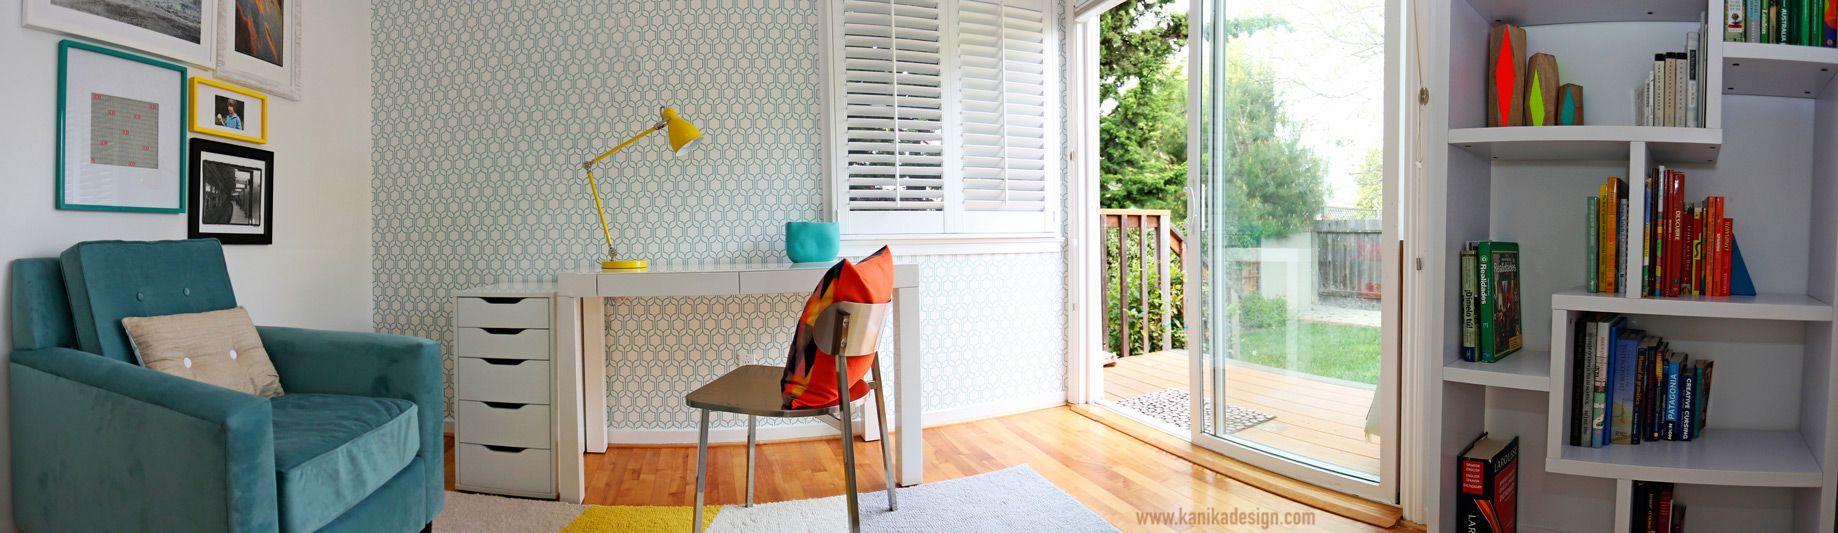 San mateo home office interior design project www.kanikadesign.com #interiordesign #homeoffice #modern #decor #decoration #lifestyle #design #homedecor #home